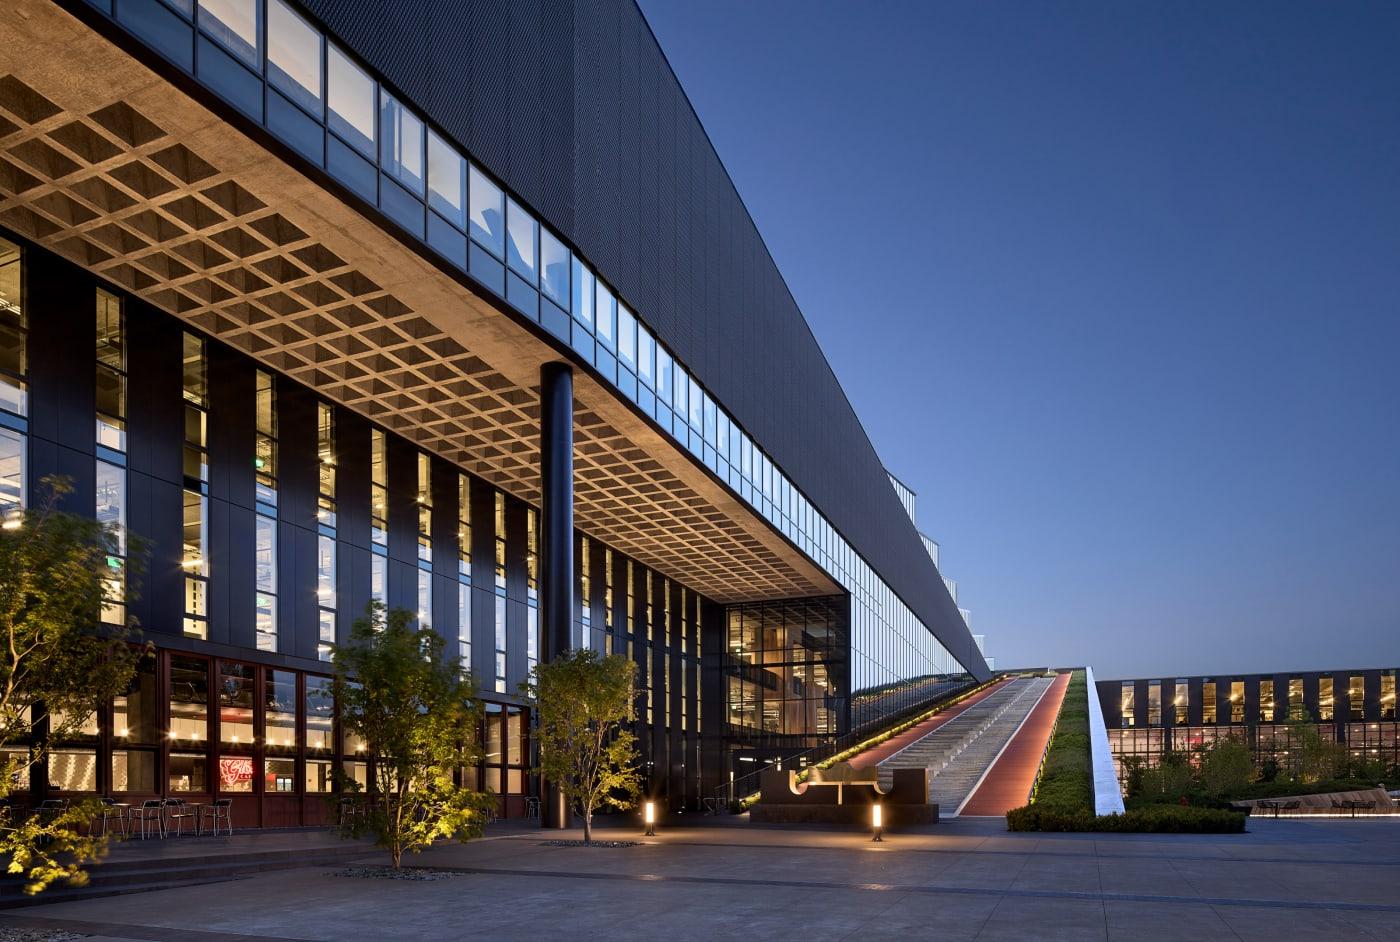 The LeBron James Innovation Center at Nike's world headquarters in Beaverton Oregon